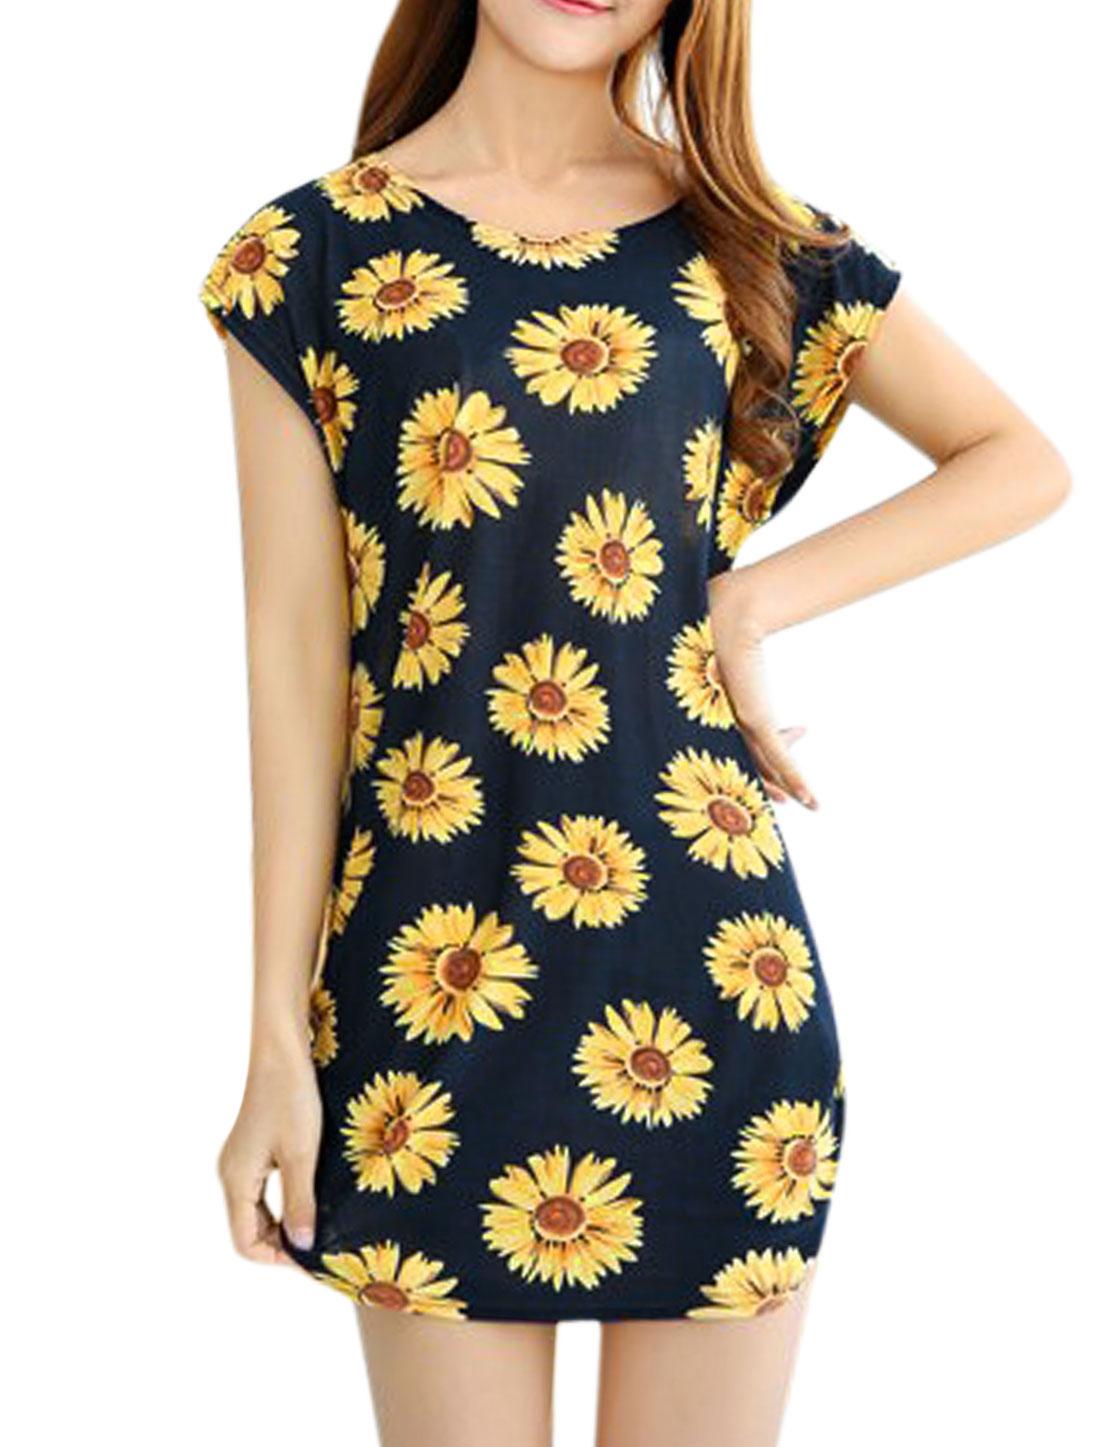 Women Short Sleeve Flower Print Sides Shirred Dress Navy Blue Yellow S